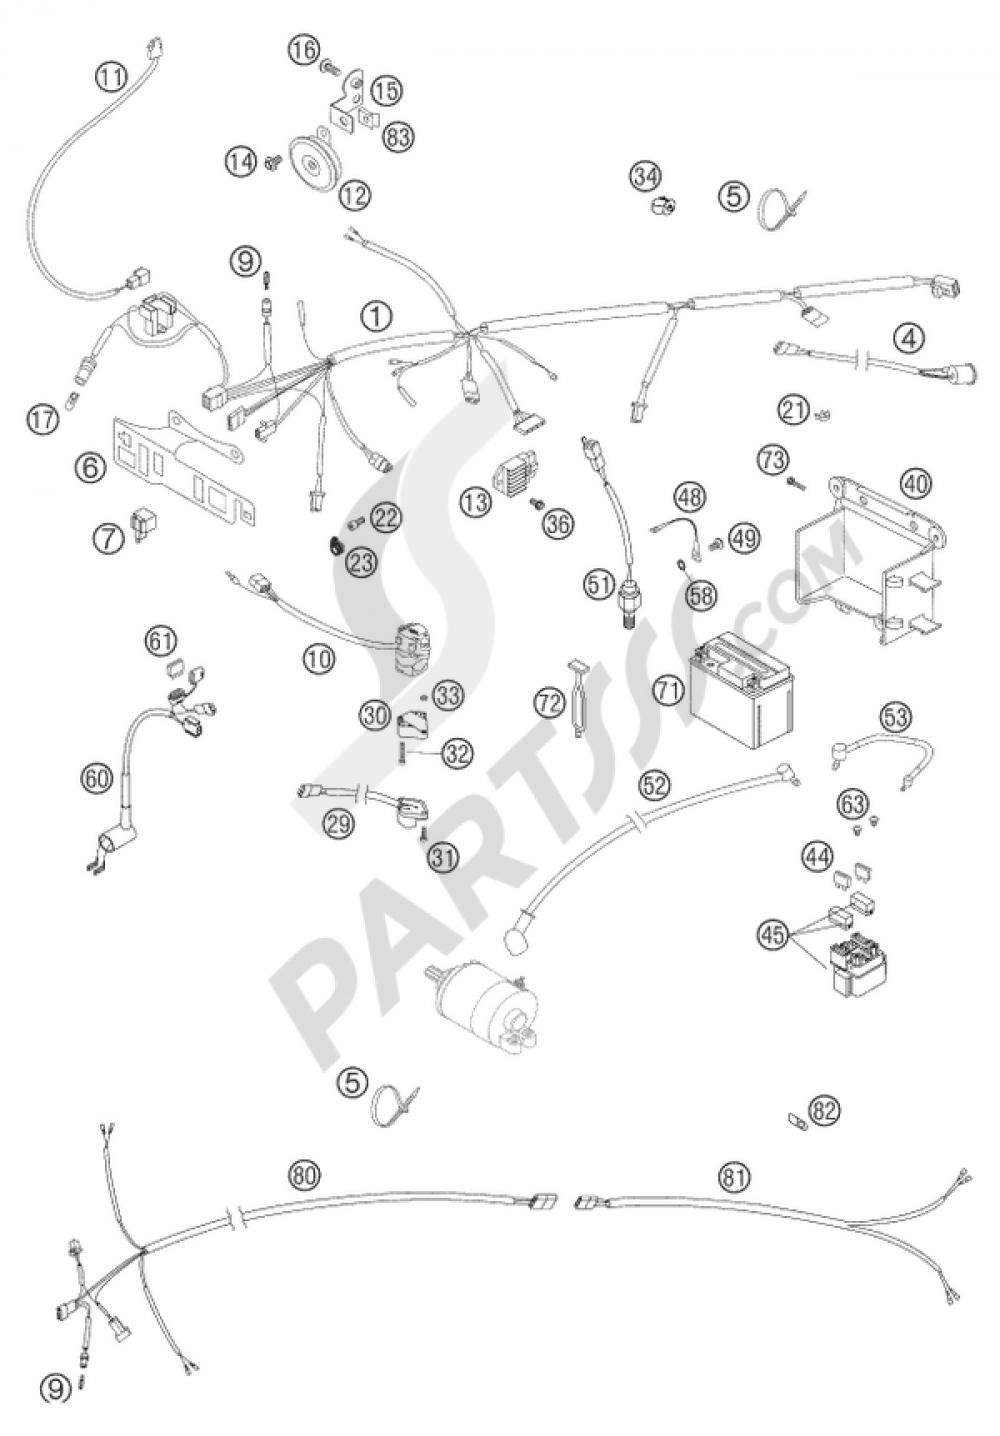 Ktm 525 Wiring Harness Explained Diagrams Racing Eu Aus Mxc Desert 2004 Motorcycles